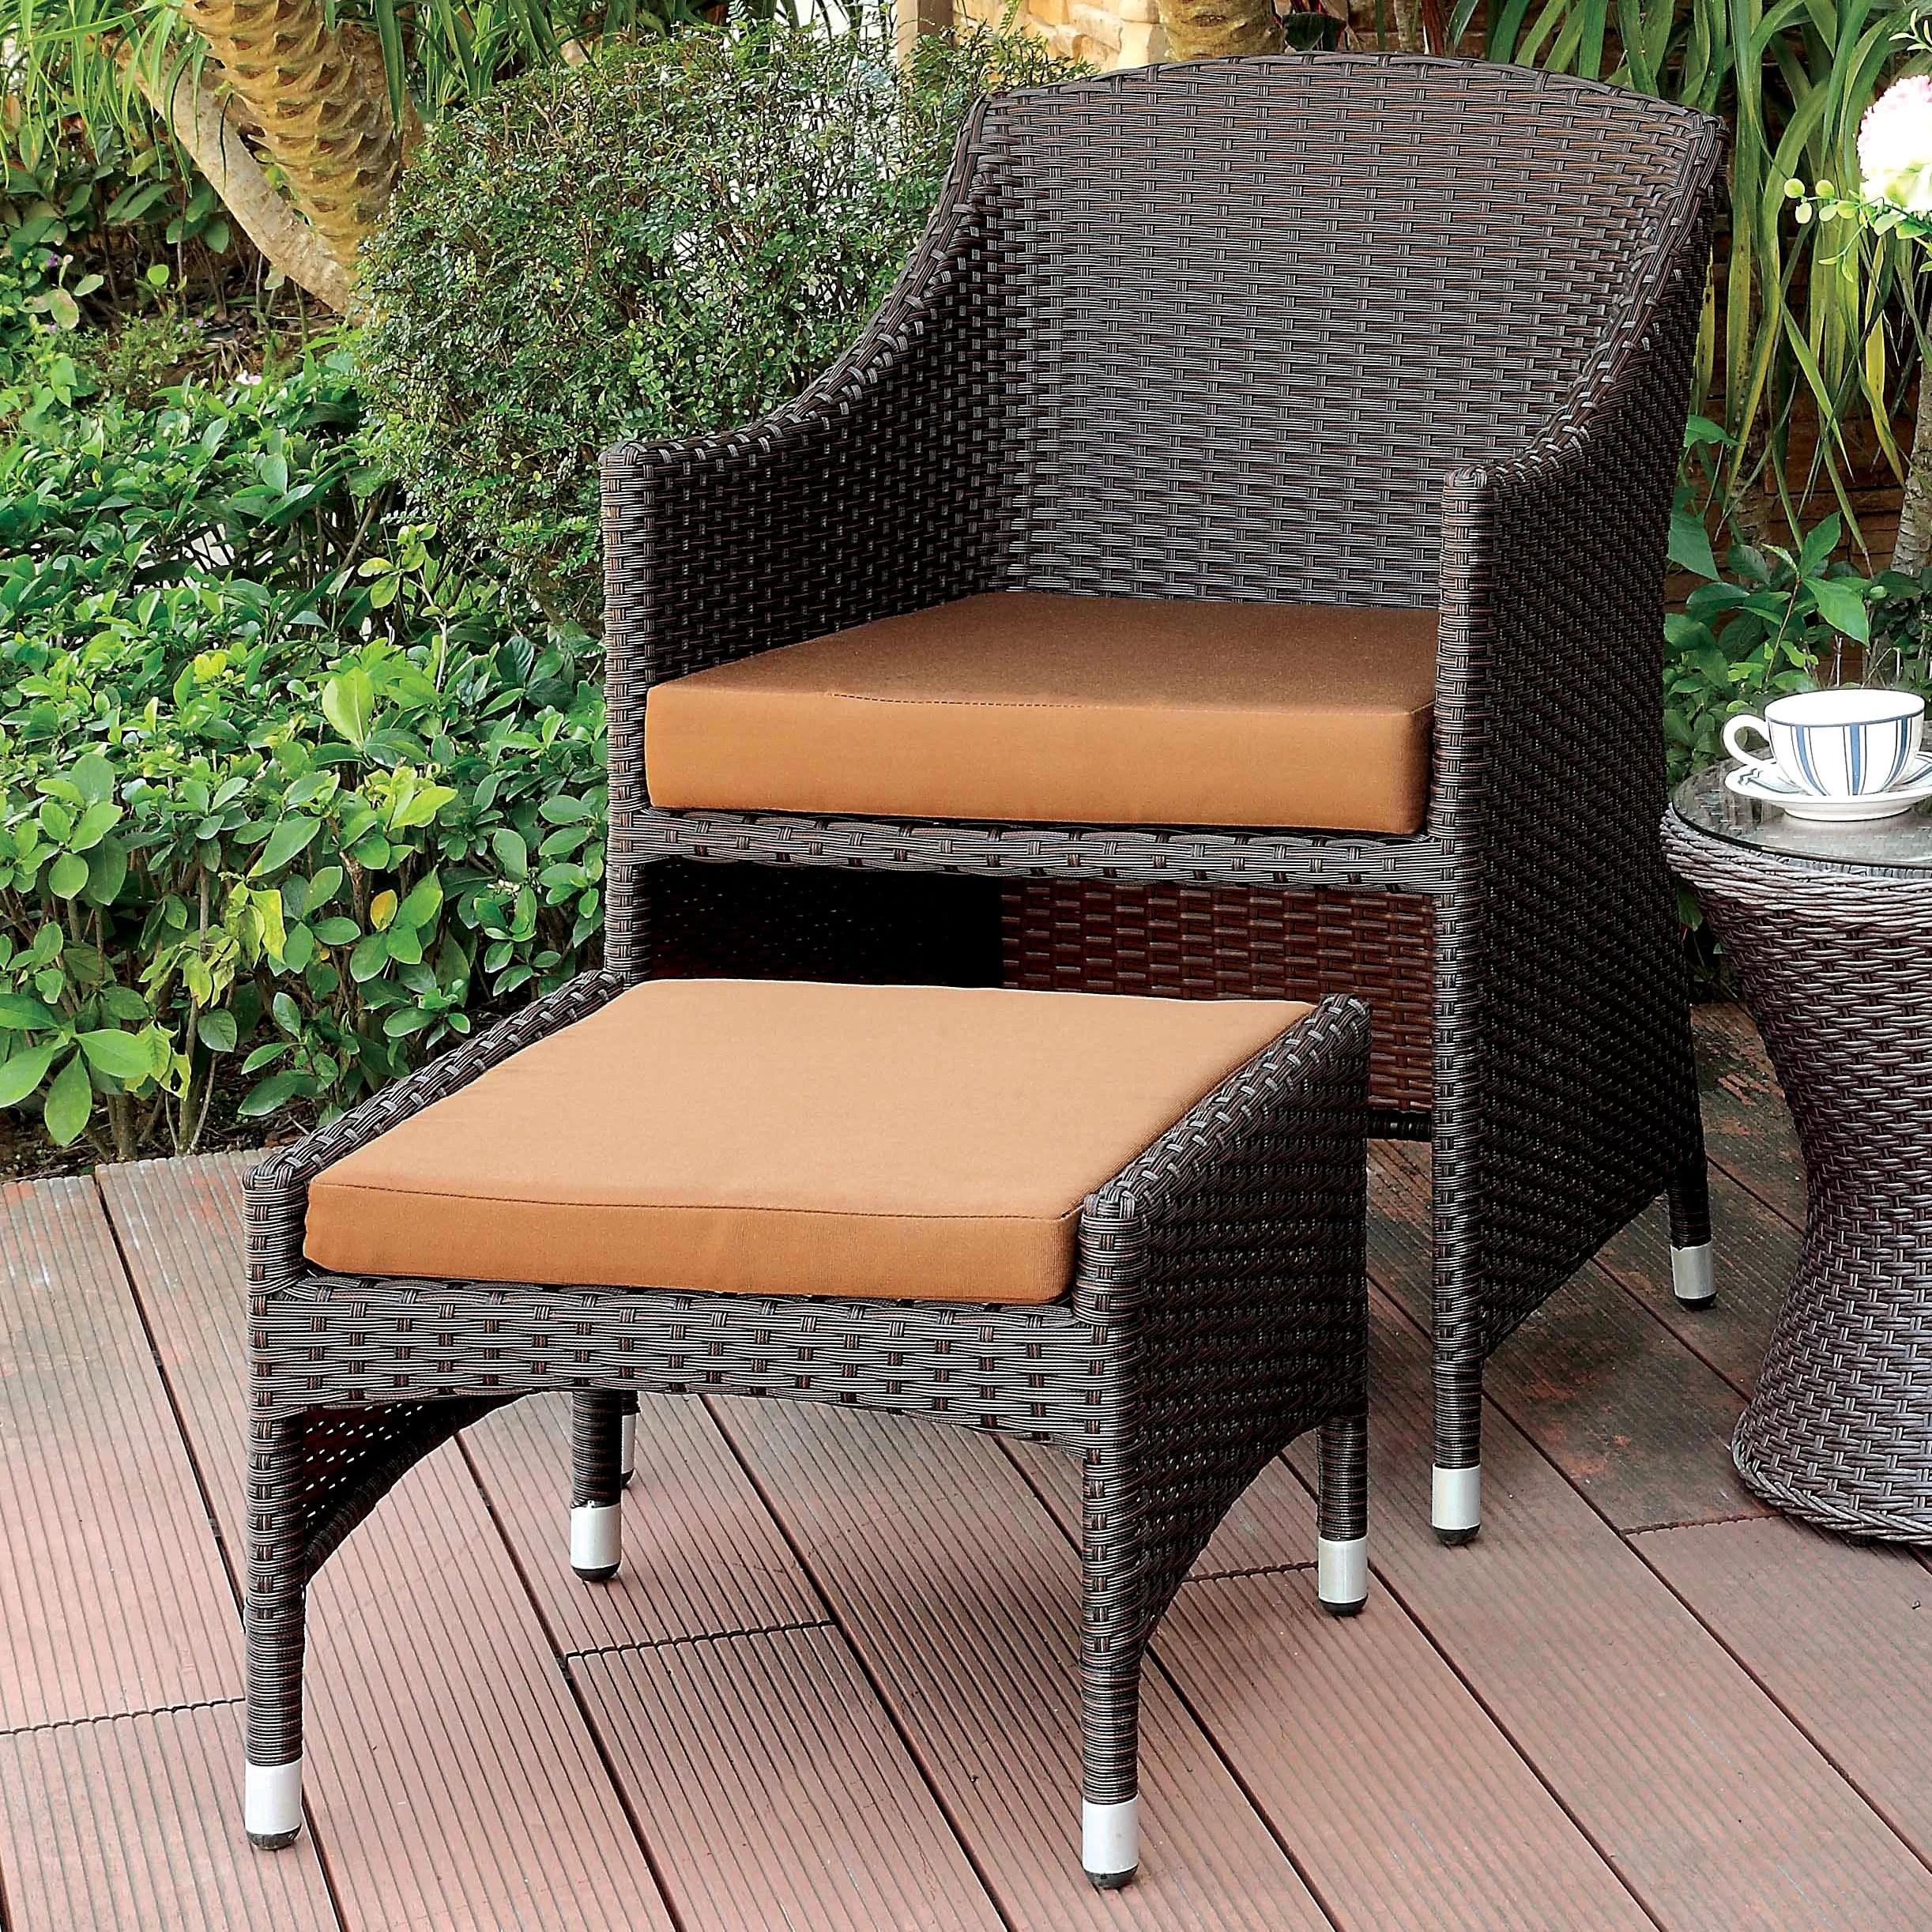 hagemann patio chair with cushions and ottoman